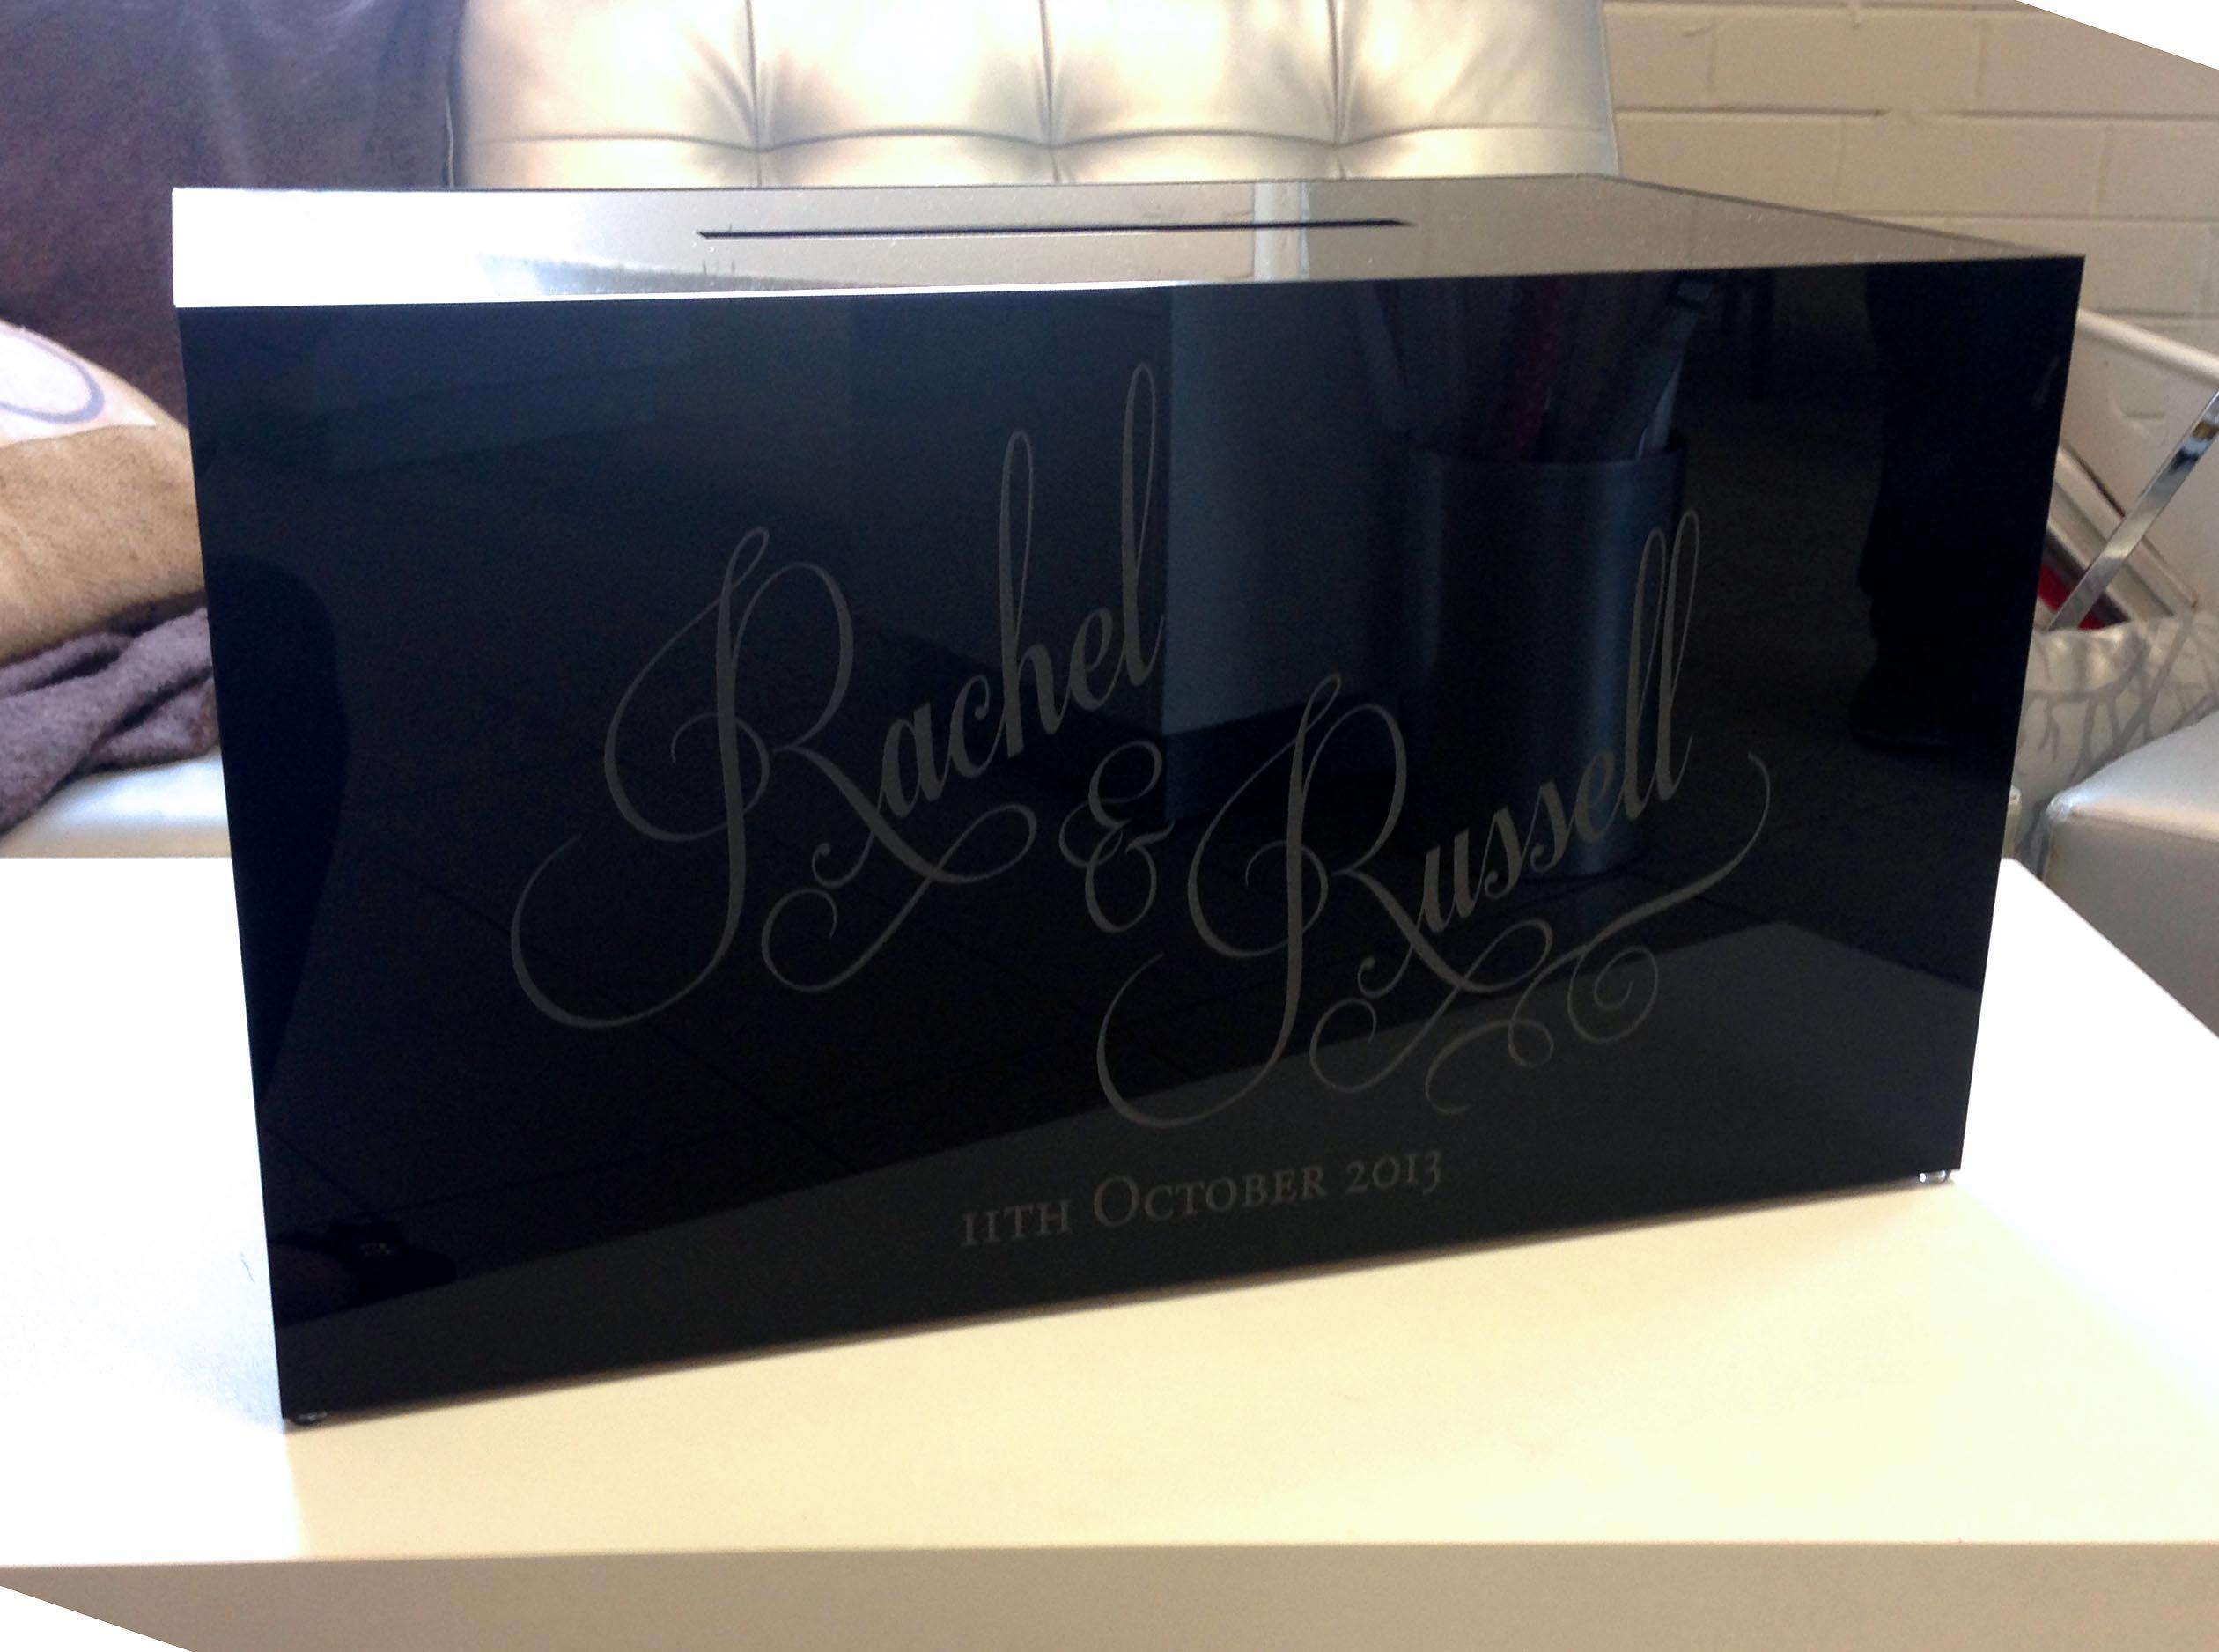 Black gloss acrylic Gift box for the wedding reception